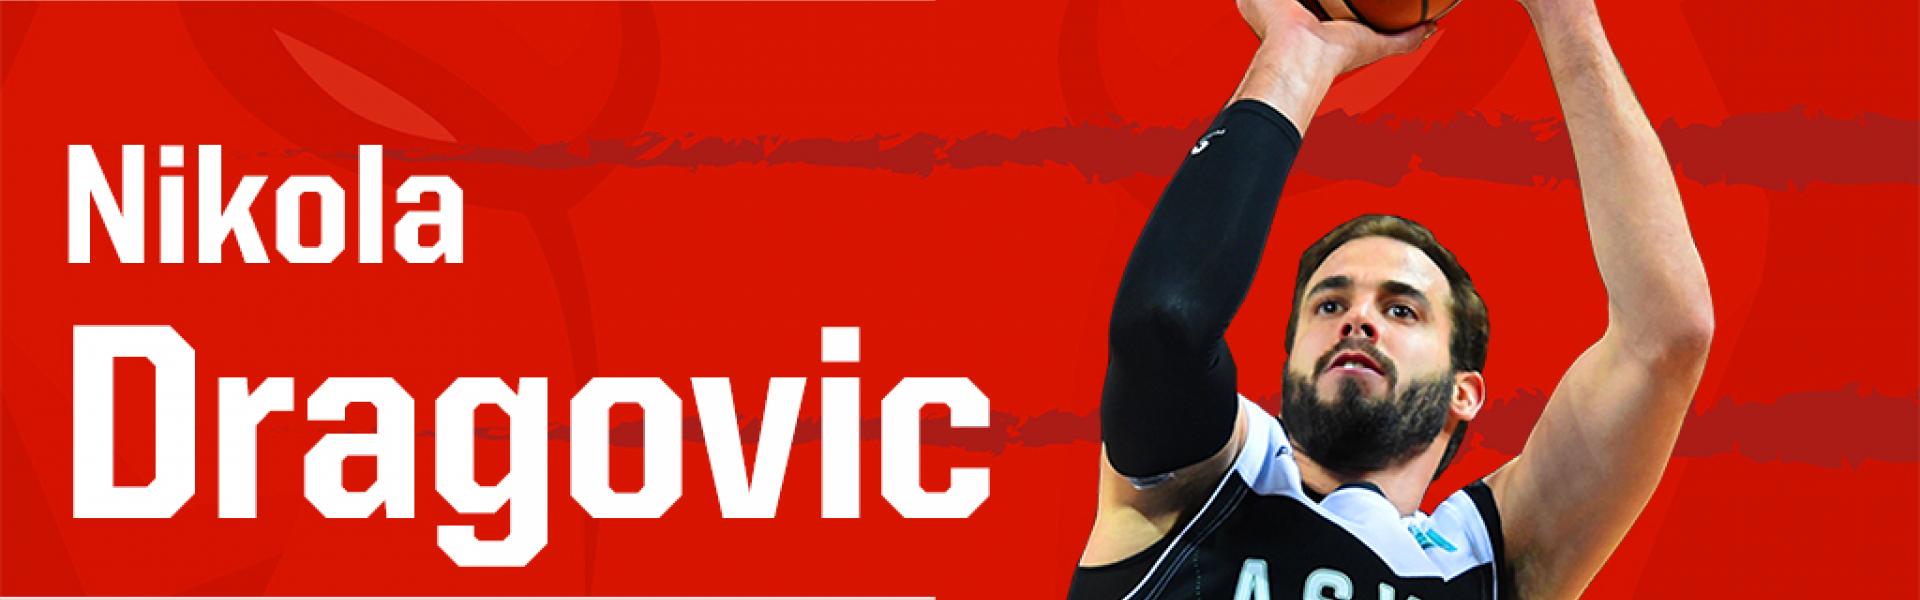 Calendario Tecnyconta.Tecnyconta Zaragoza Incorpora Al Ala Pivot Nikola Dragovic Basket